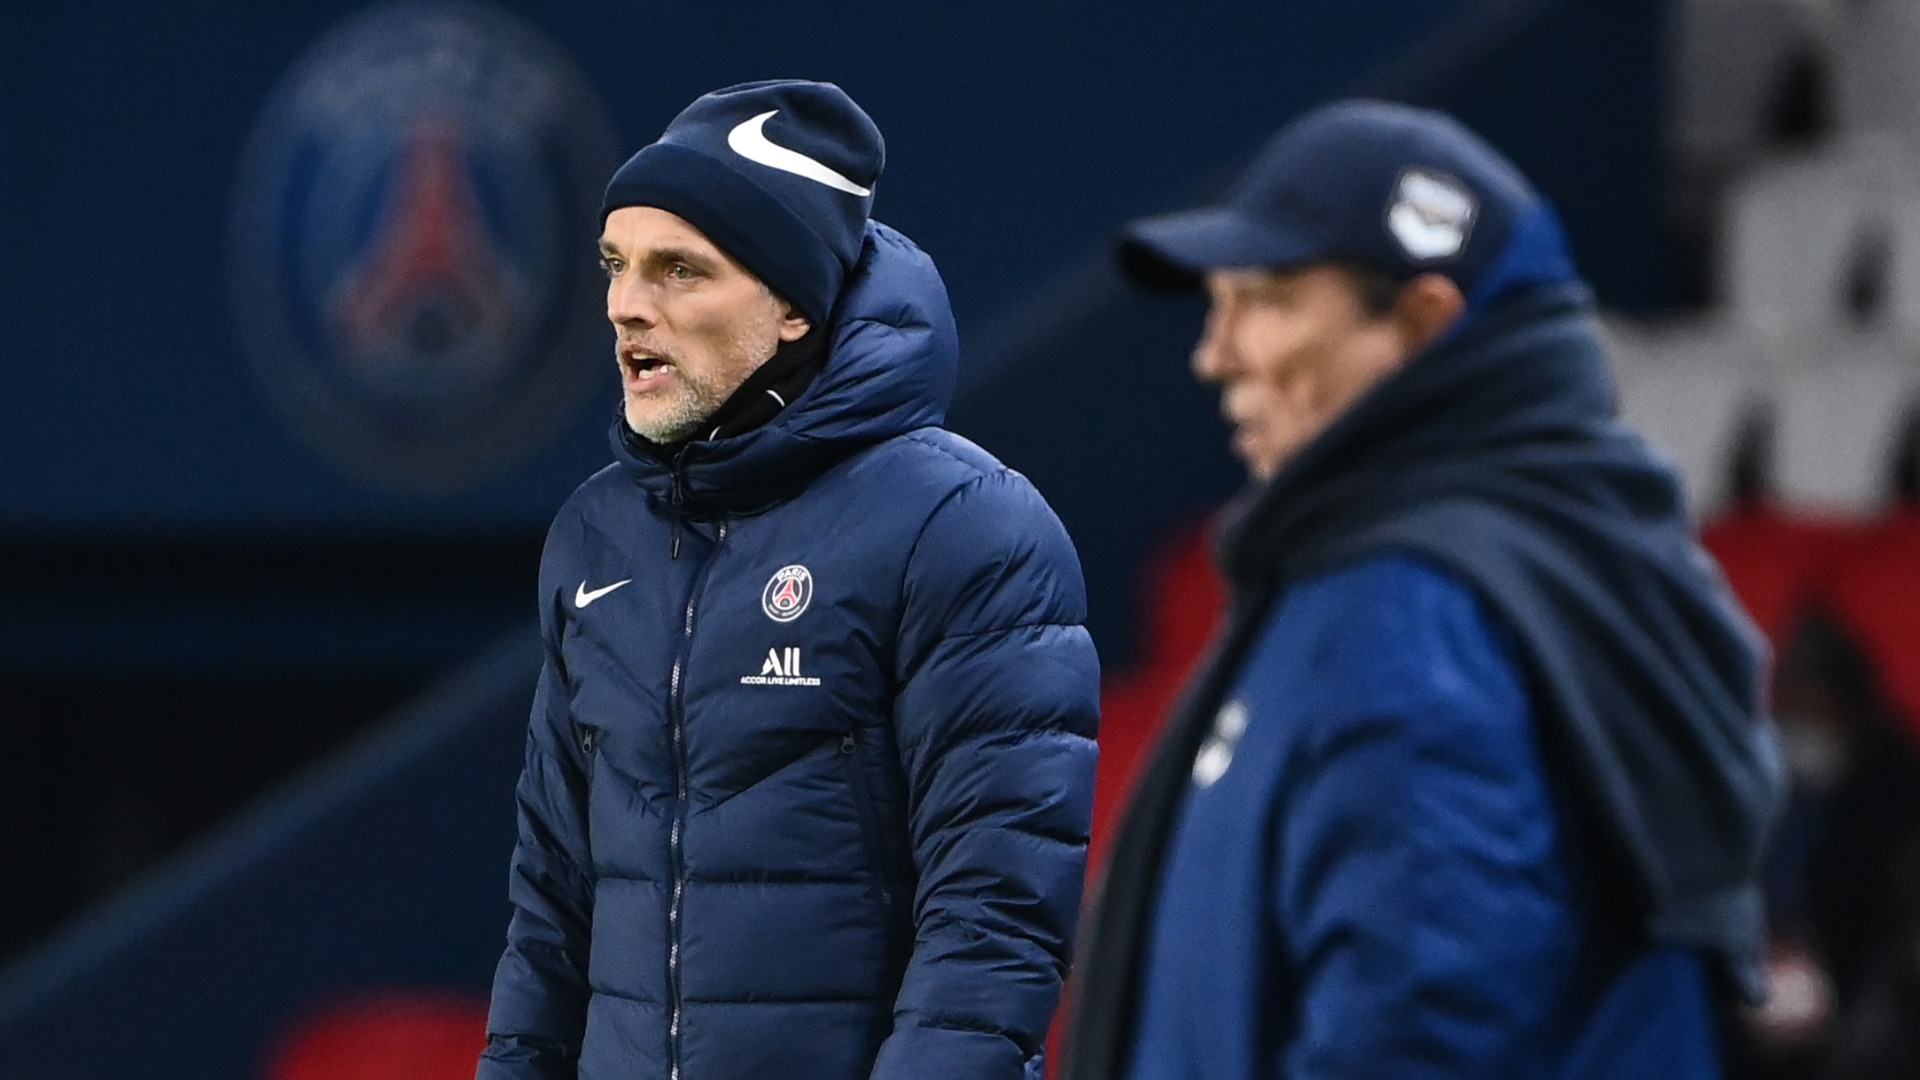 PSG stutter to a draw against Bordeaux